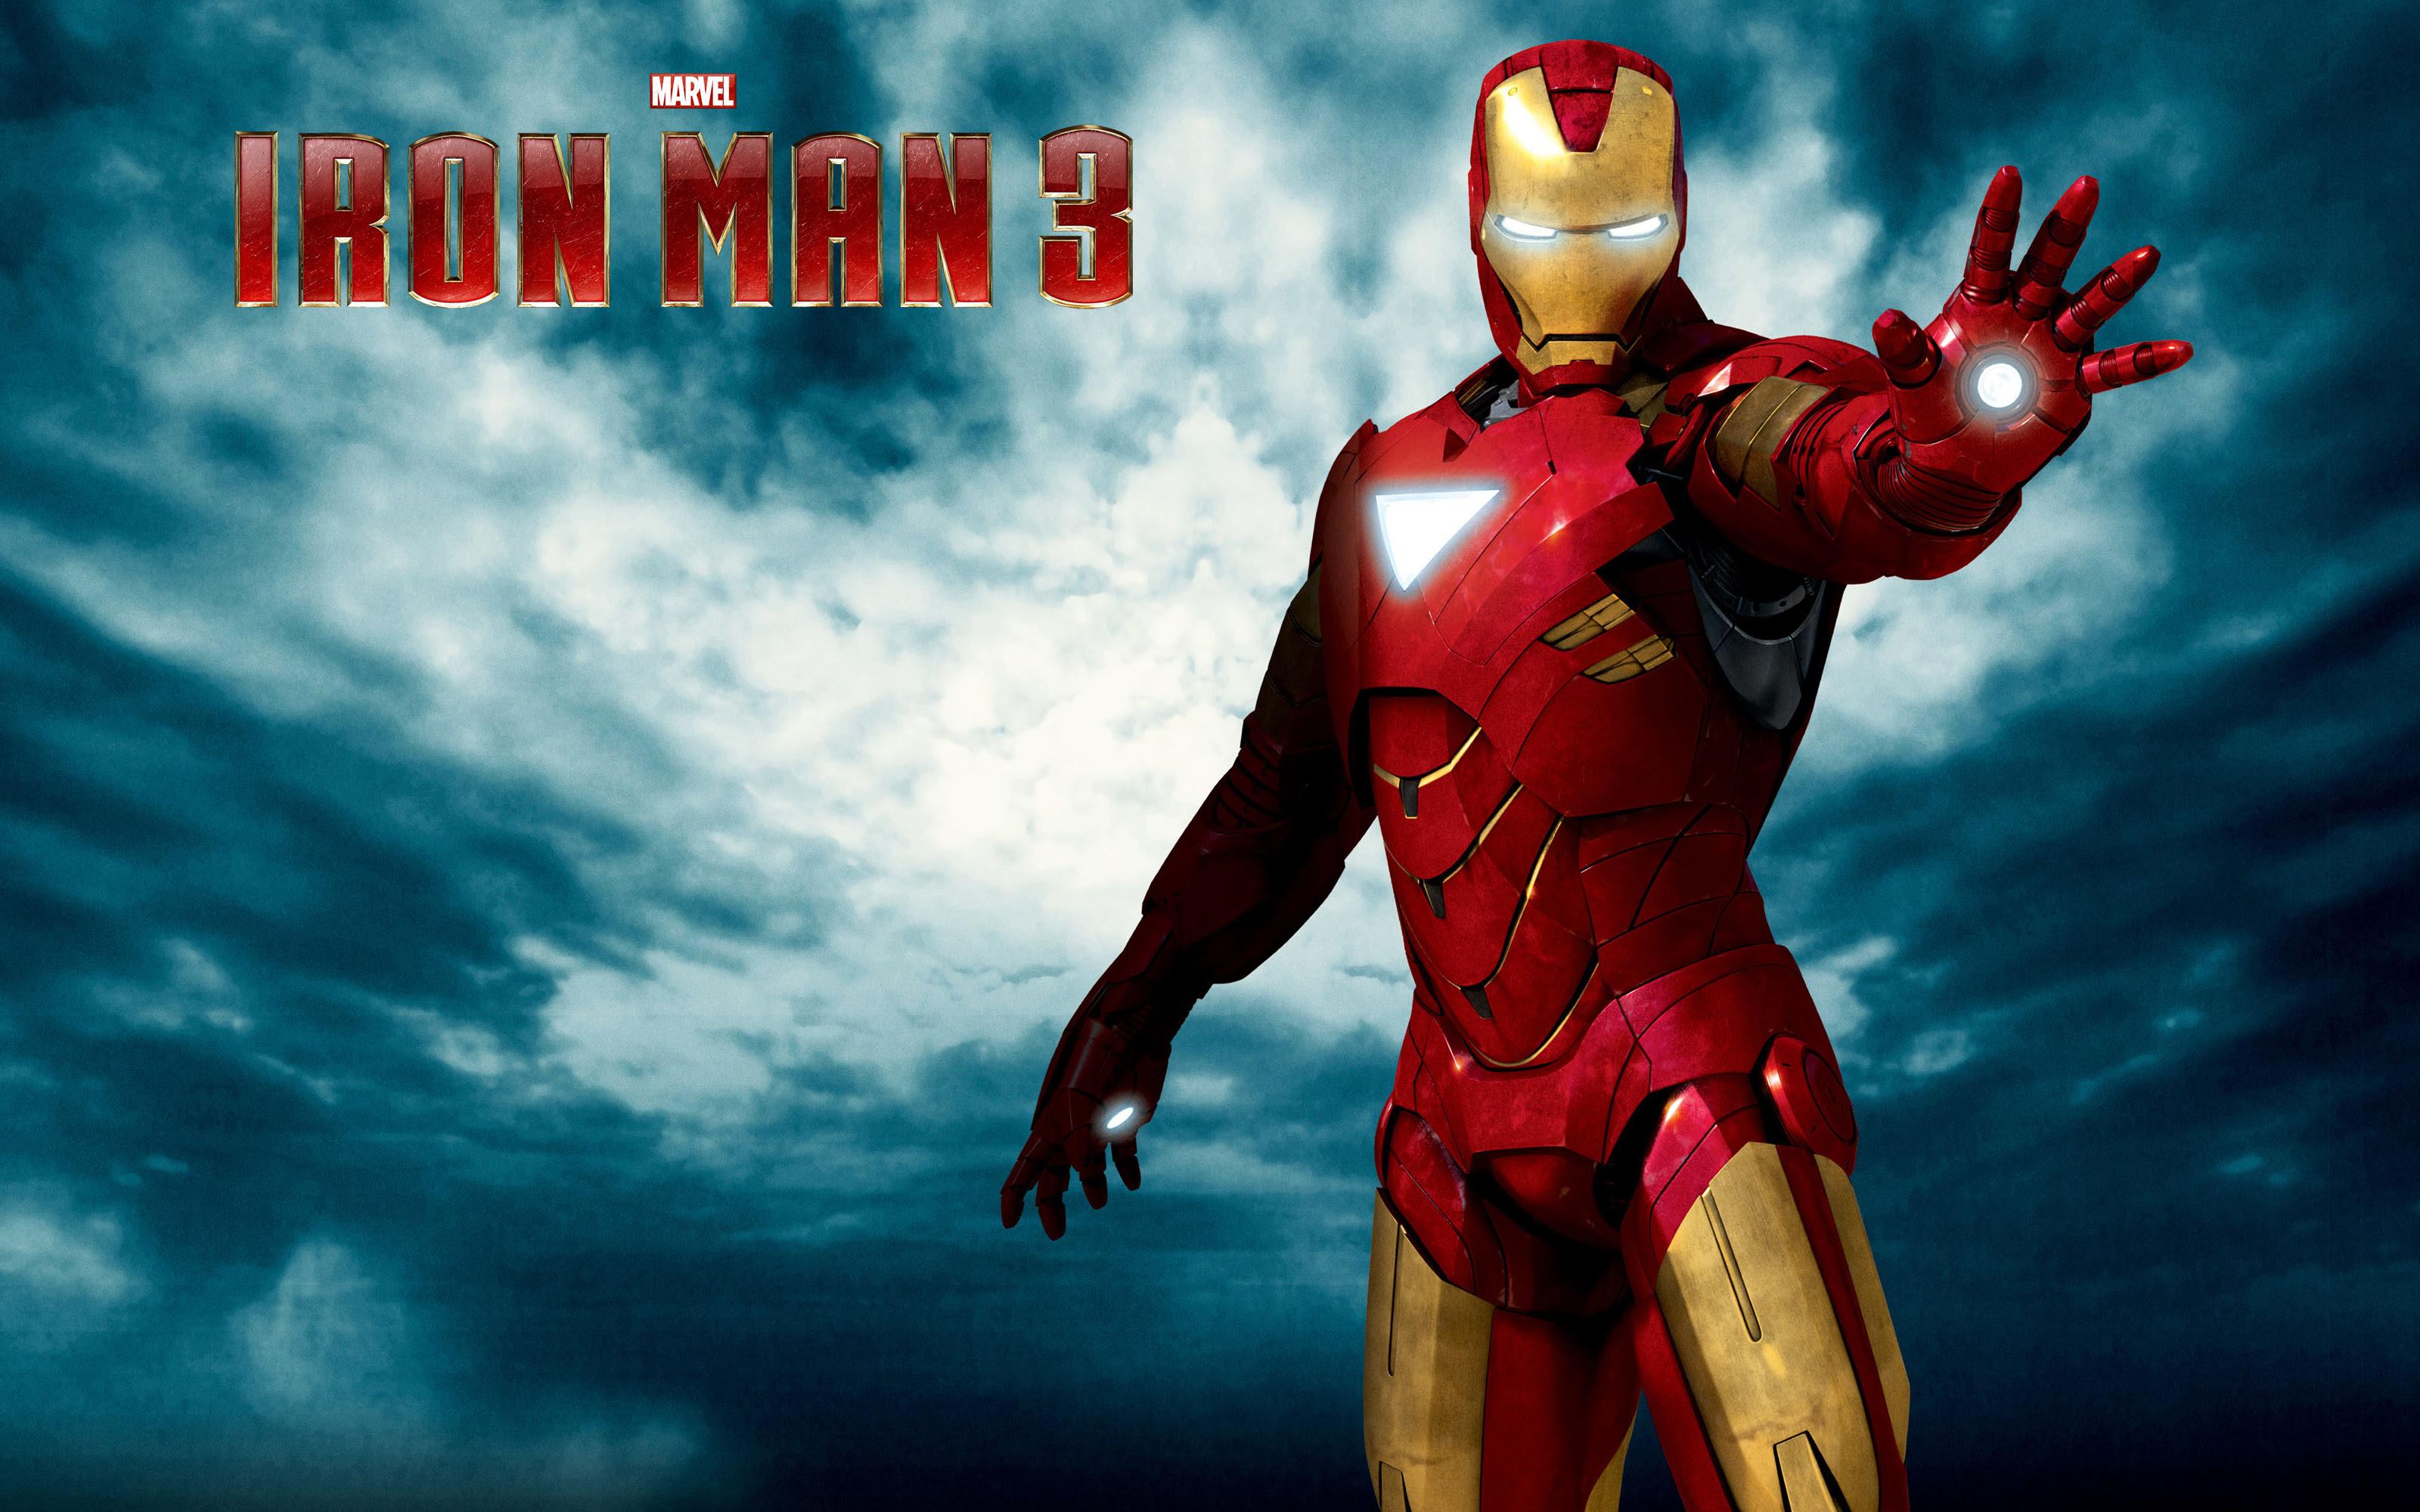 iron man hud wallpaper my iron man desktopmasduke